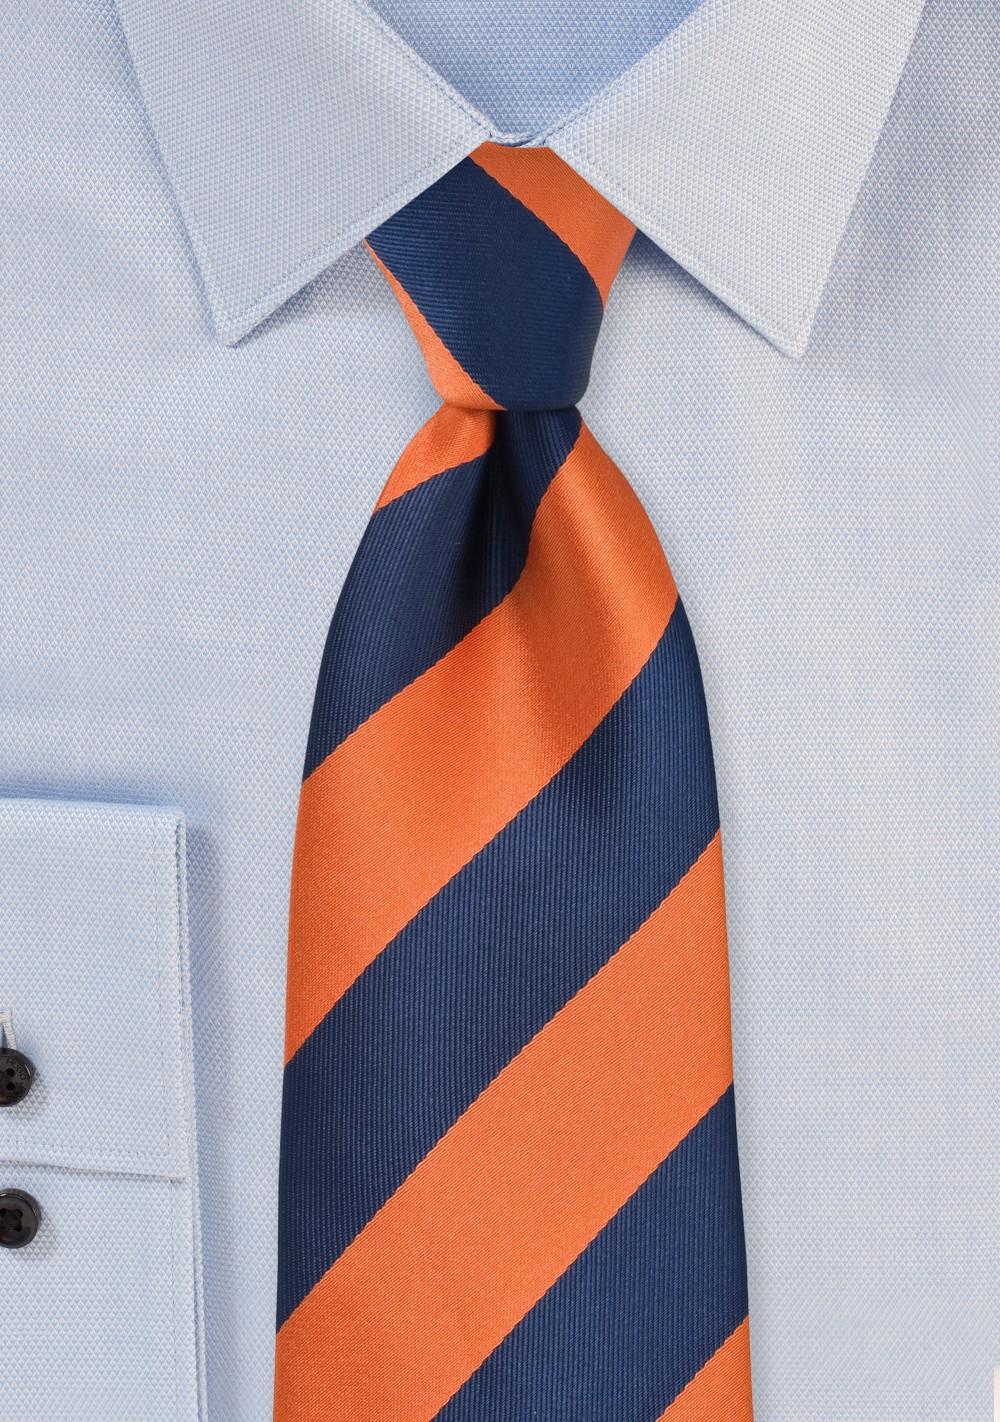 Preppy Kids Tie in Orange and Navy